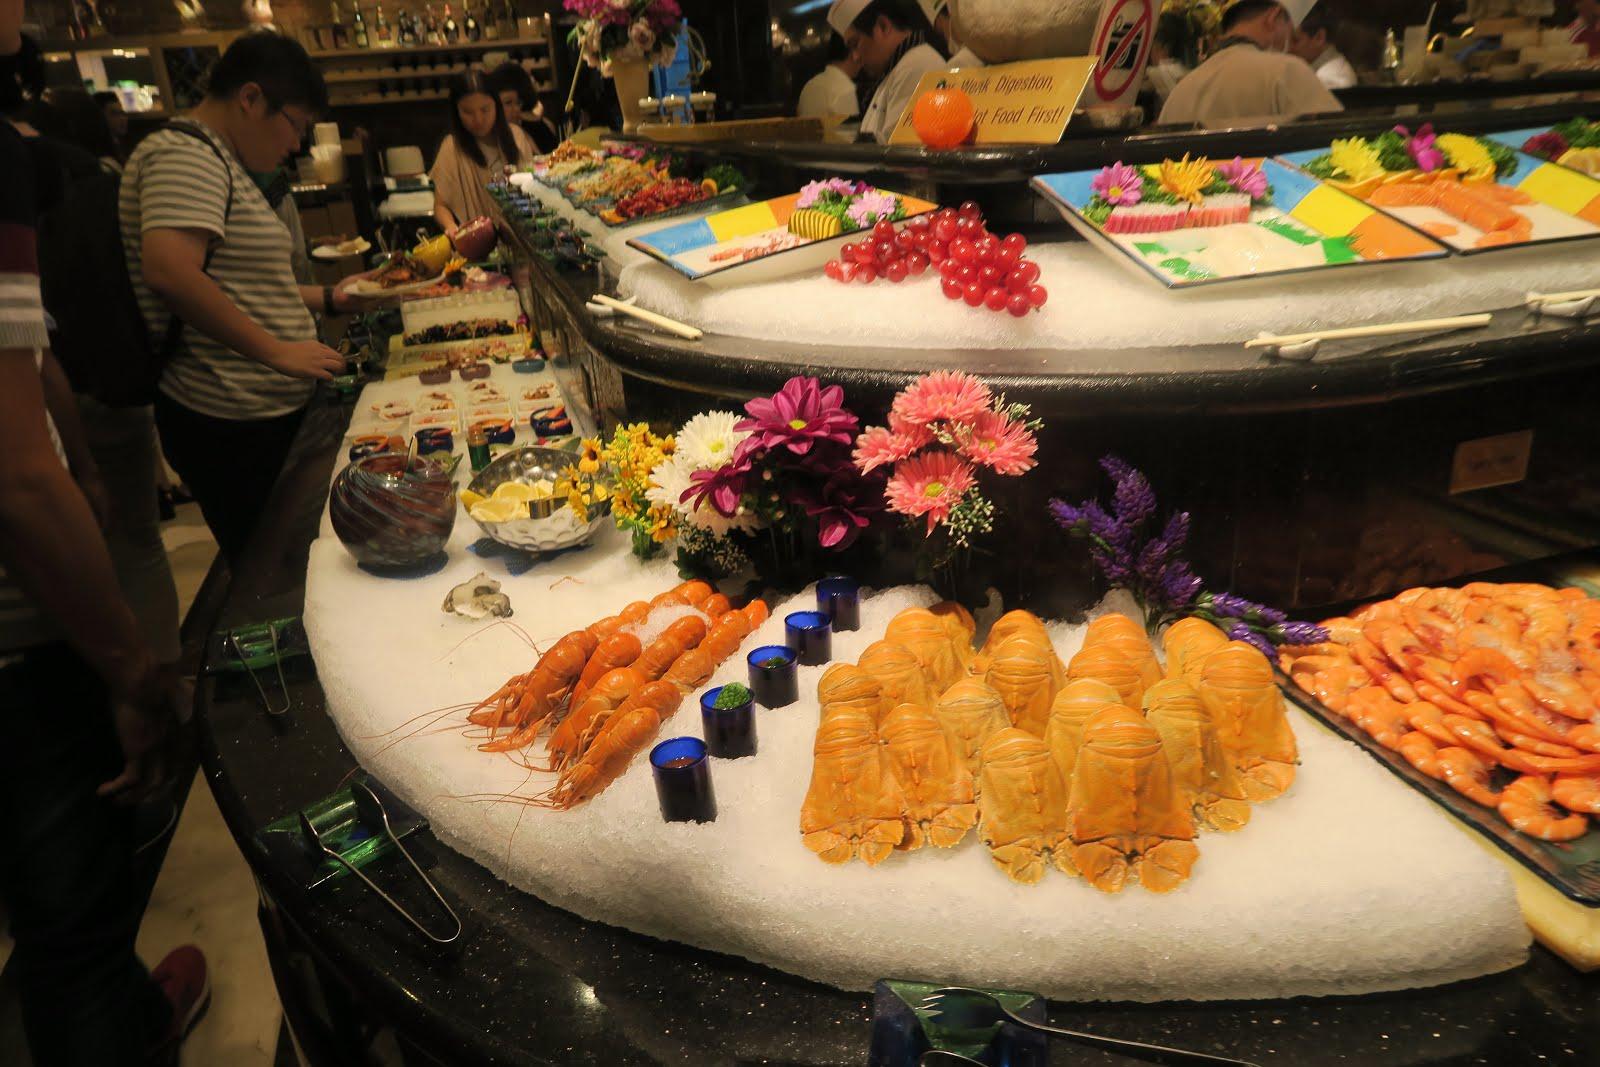 vienna international seafood teppanyaki restaurant buffet 2017 rh pixeltreats blogspot com seafood lunch buffet bangkok seafood lunch buffet dubai